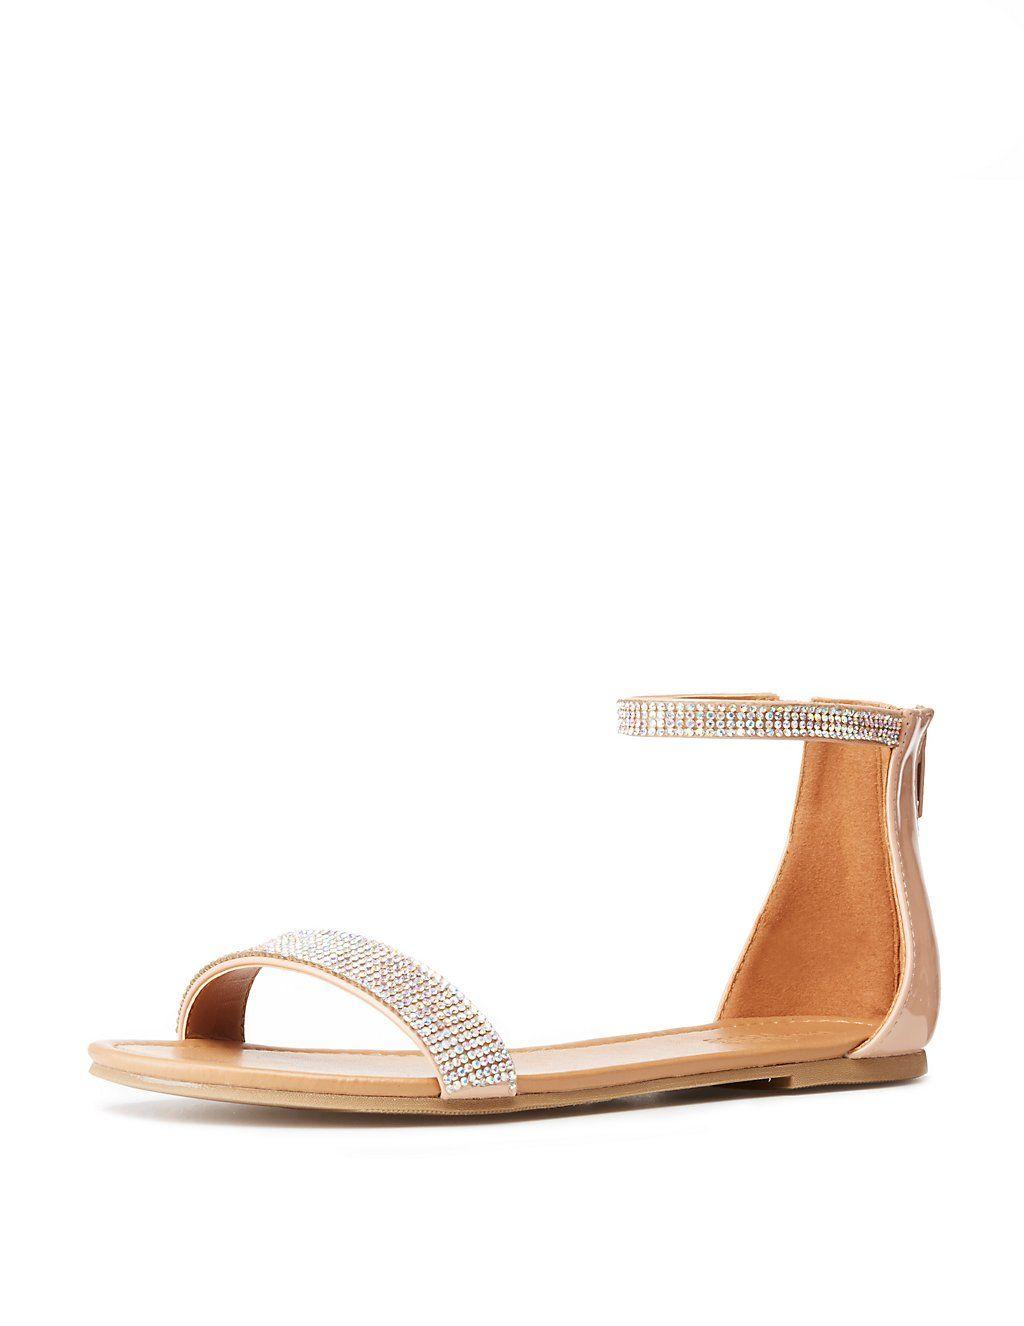 efdeddfd1c Bamboo Rhinestone Ankle Strap Flat Sandals in 2019 | Wedding Shoes ...